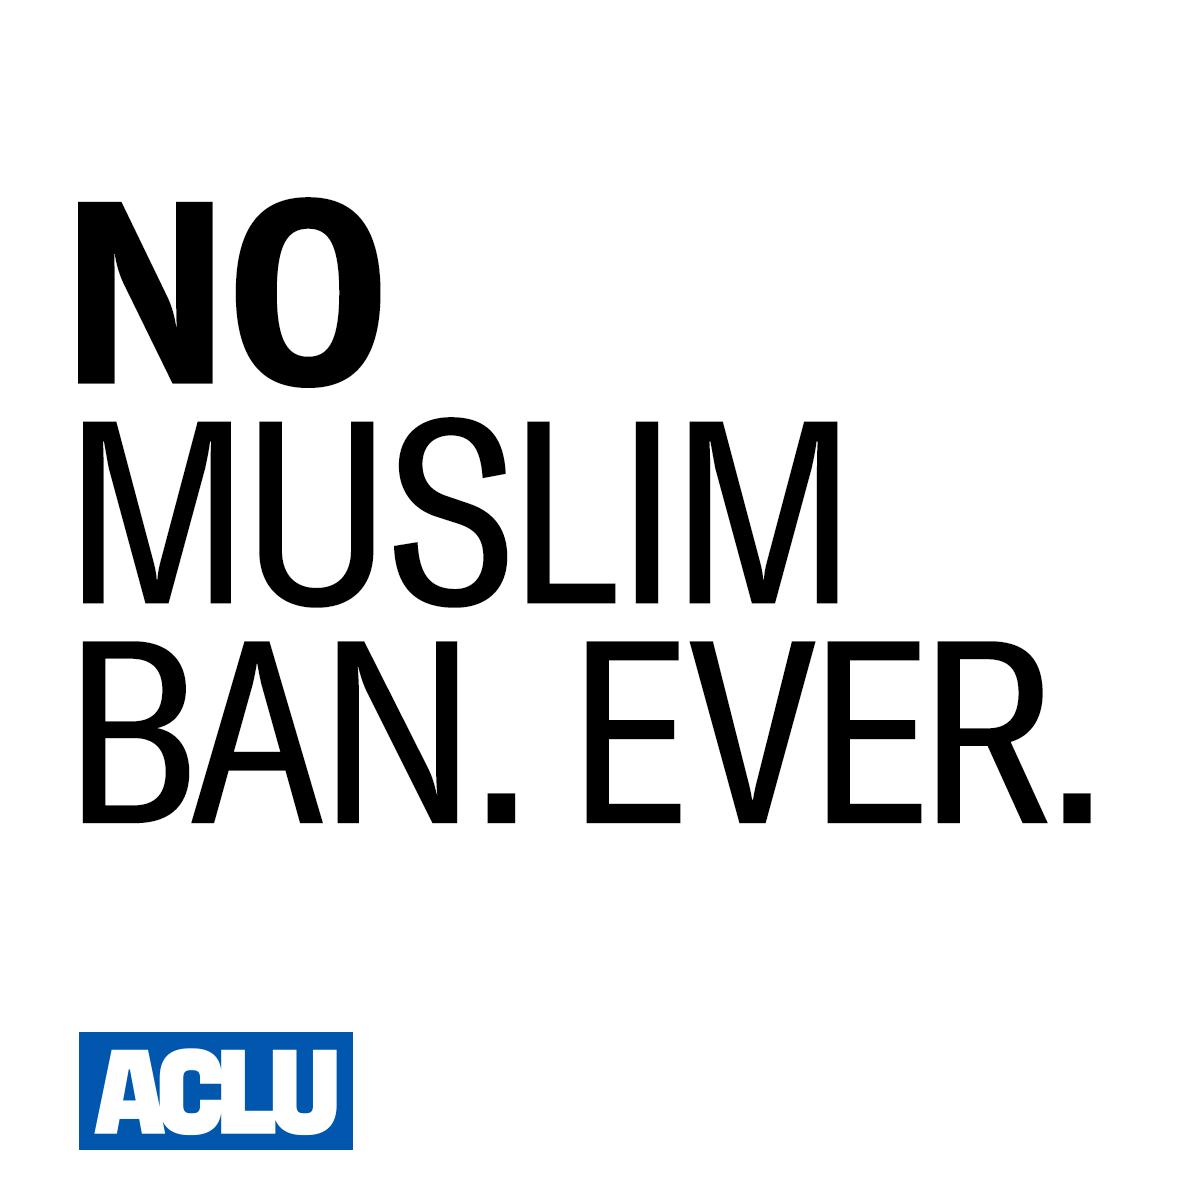 No Muslim ban ever.